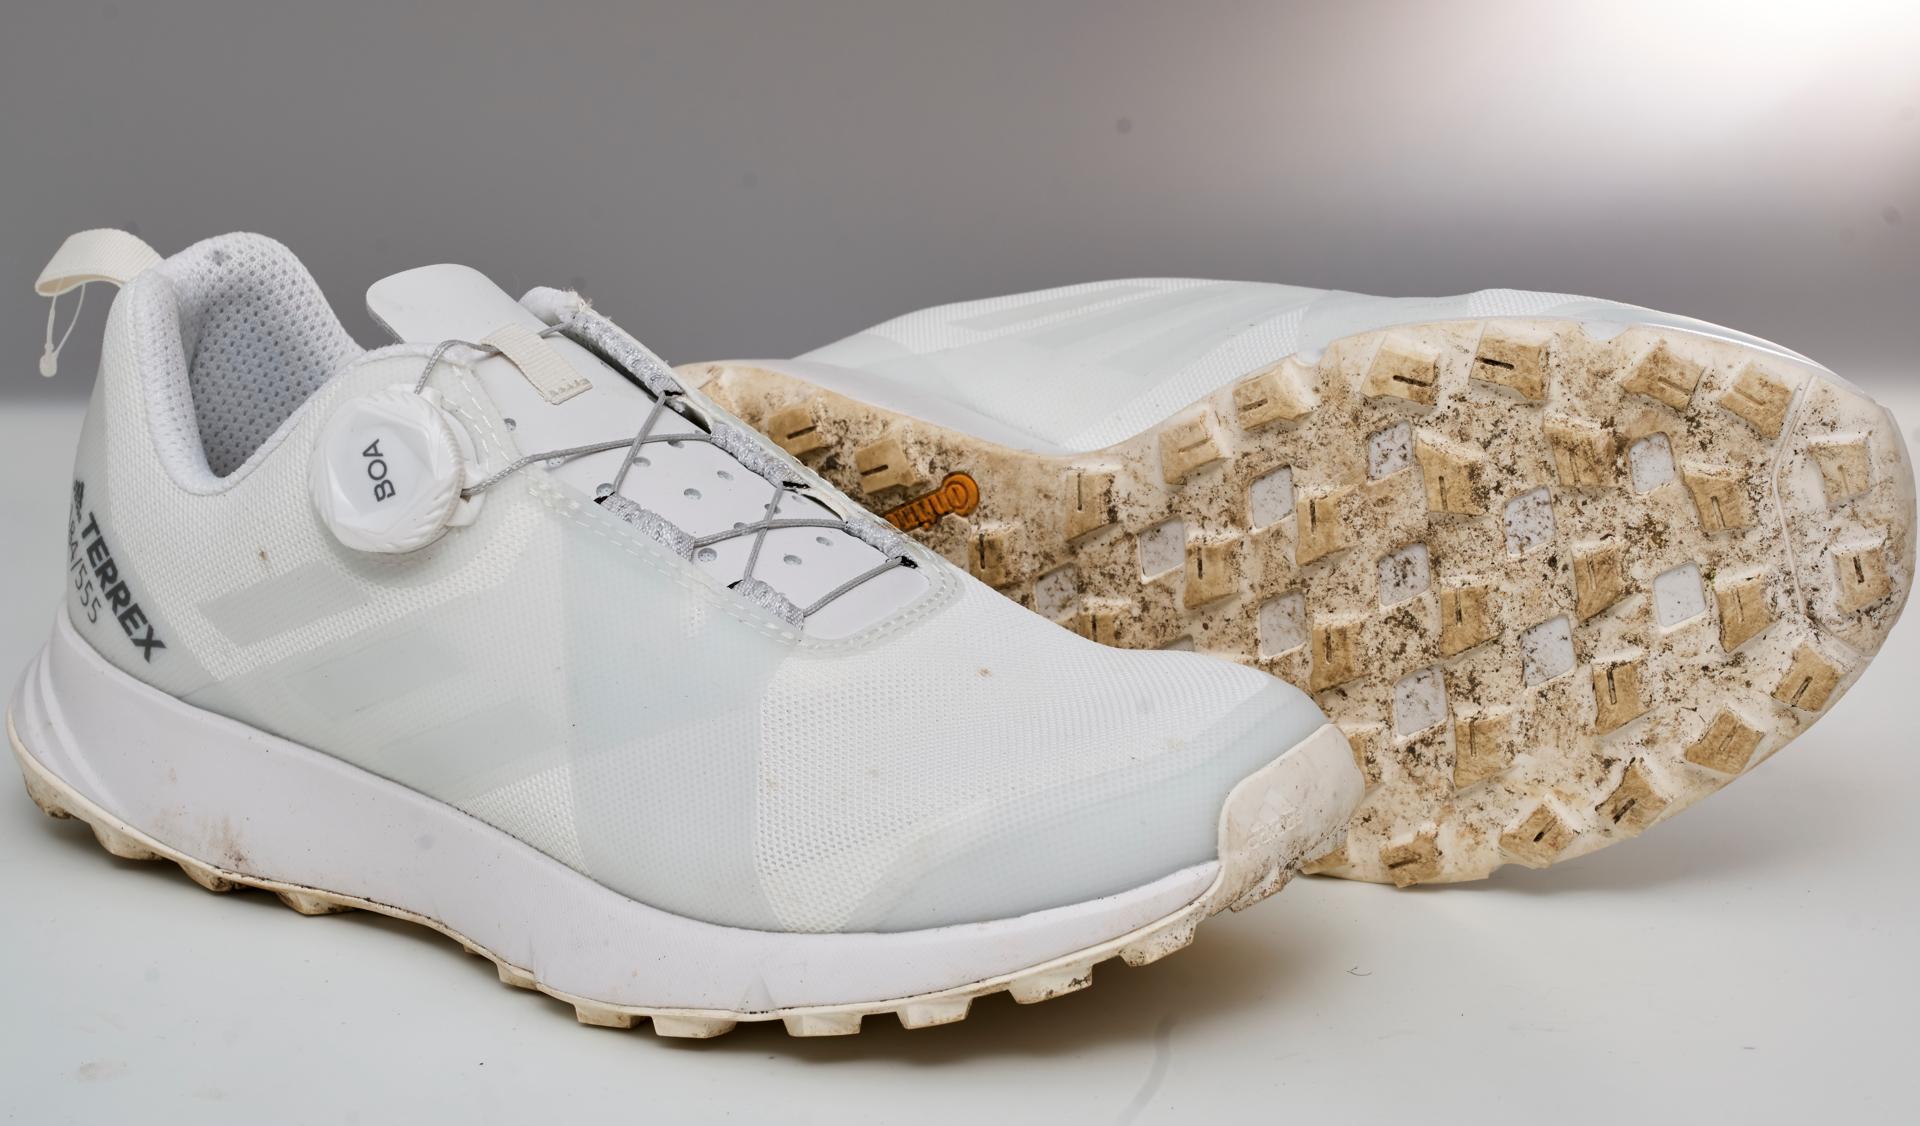 Adidas Terrex TWO Boa xc Trailrunning